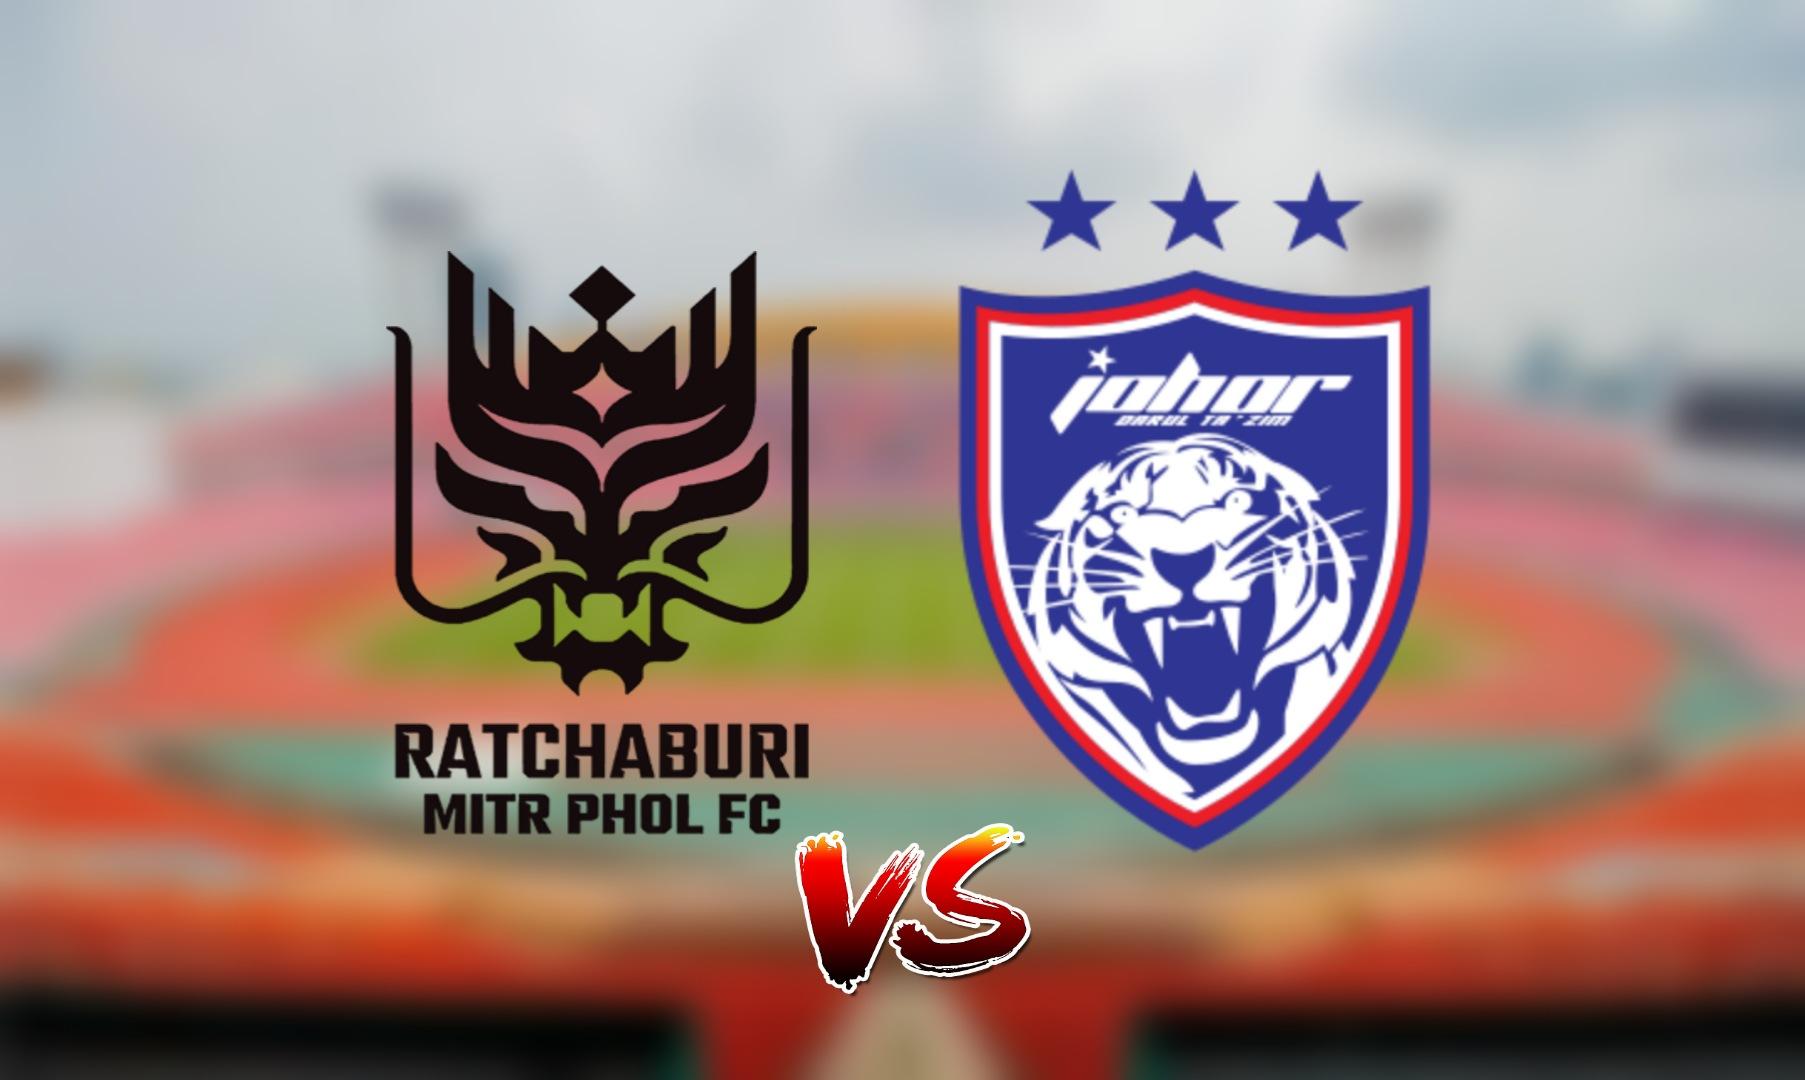 Live Streaming Ratchaburi FC vs JDT FC ACL 25 Jun 2021